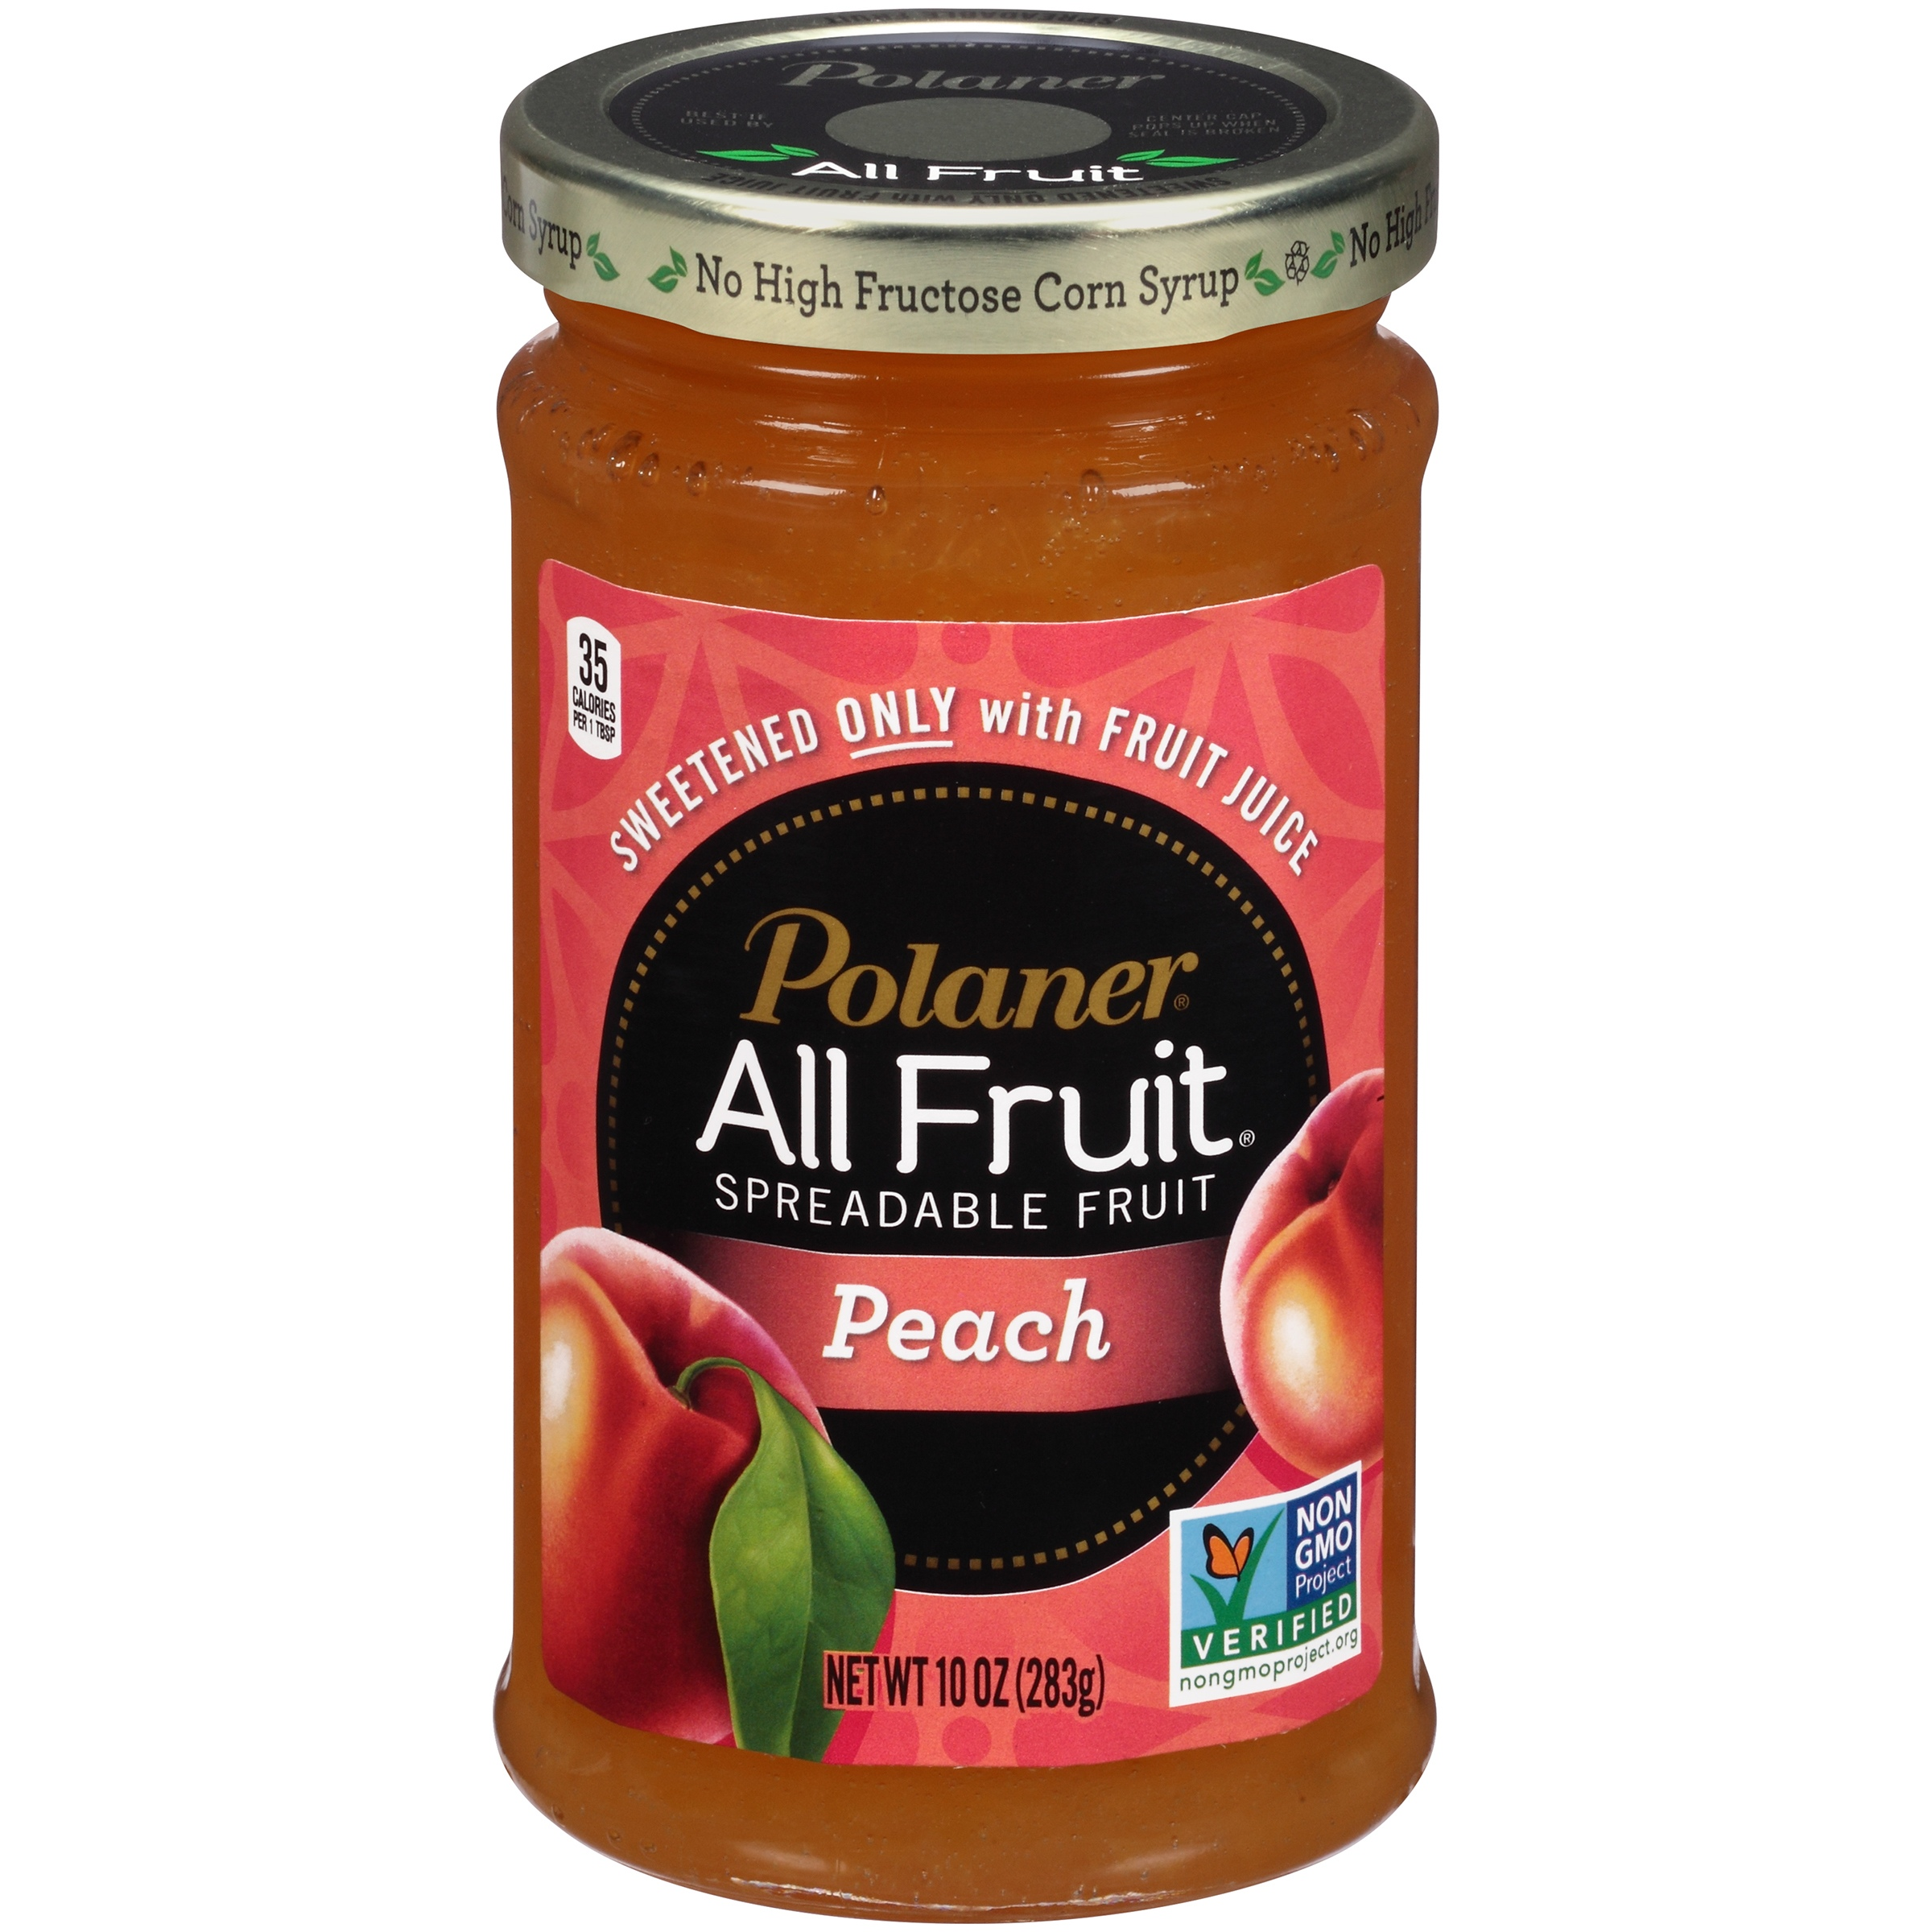 (4 Pack) Polaner All Fruit Peach Spreadable Fruit, 10 oz